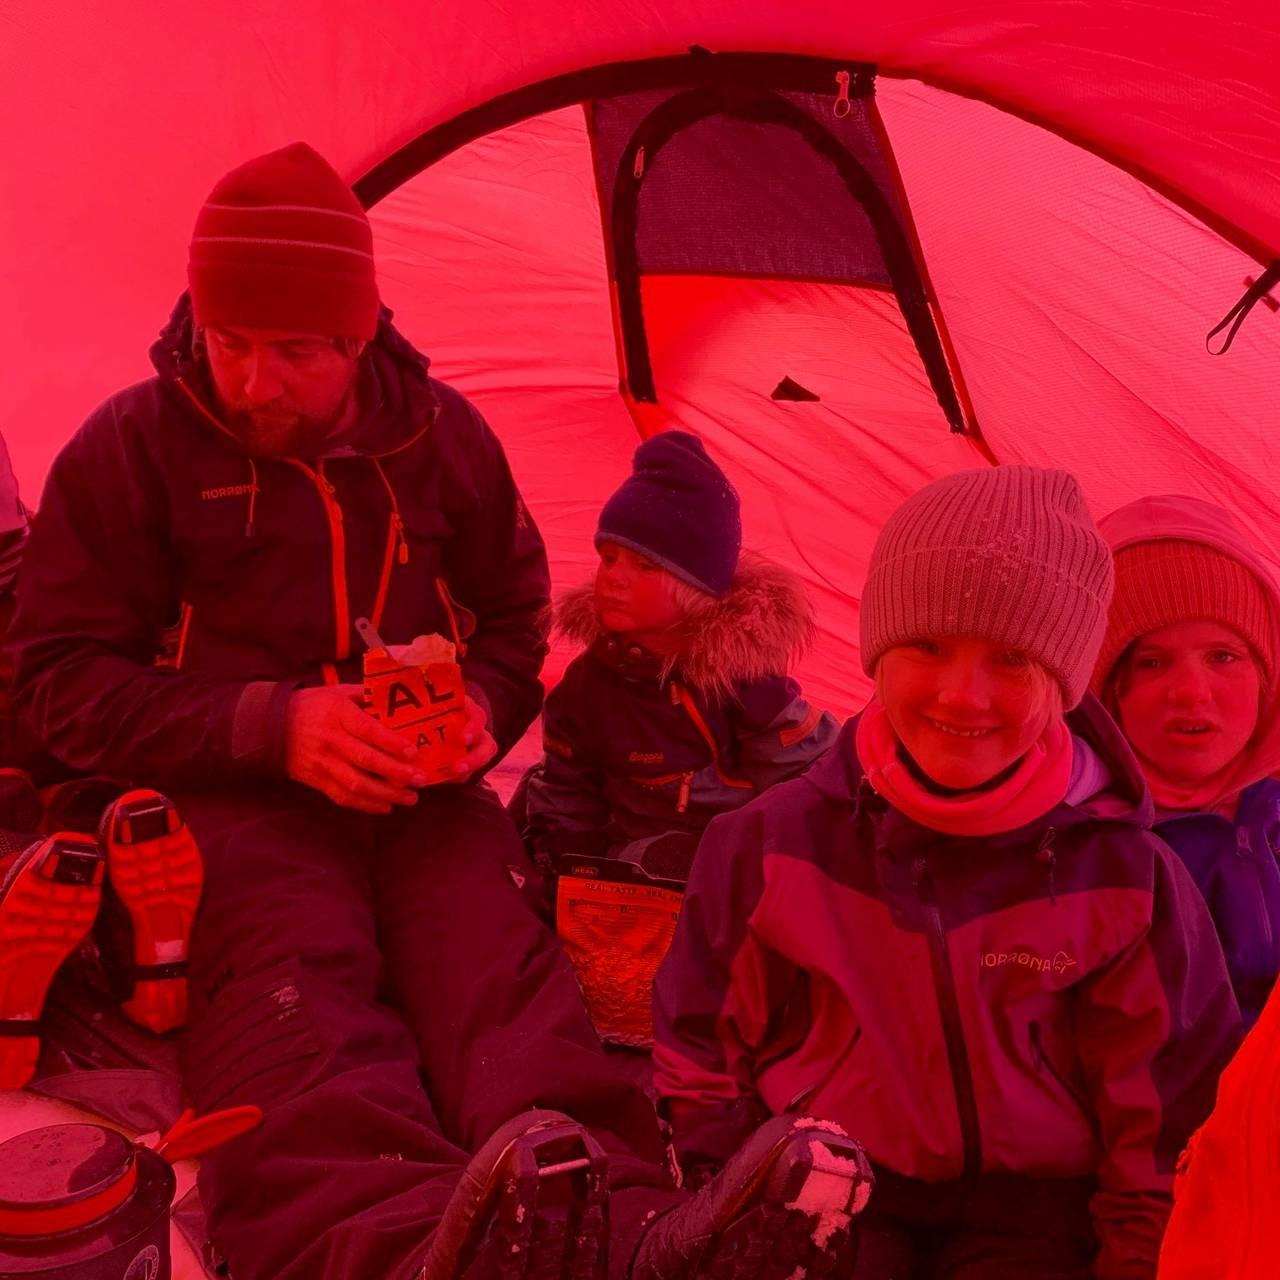 Trangt om plassen med to store og 9 små på teltur ved Sølen i Rendalen